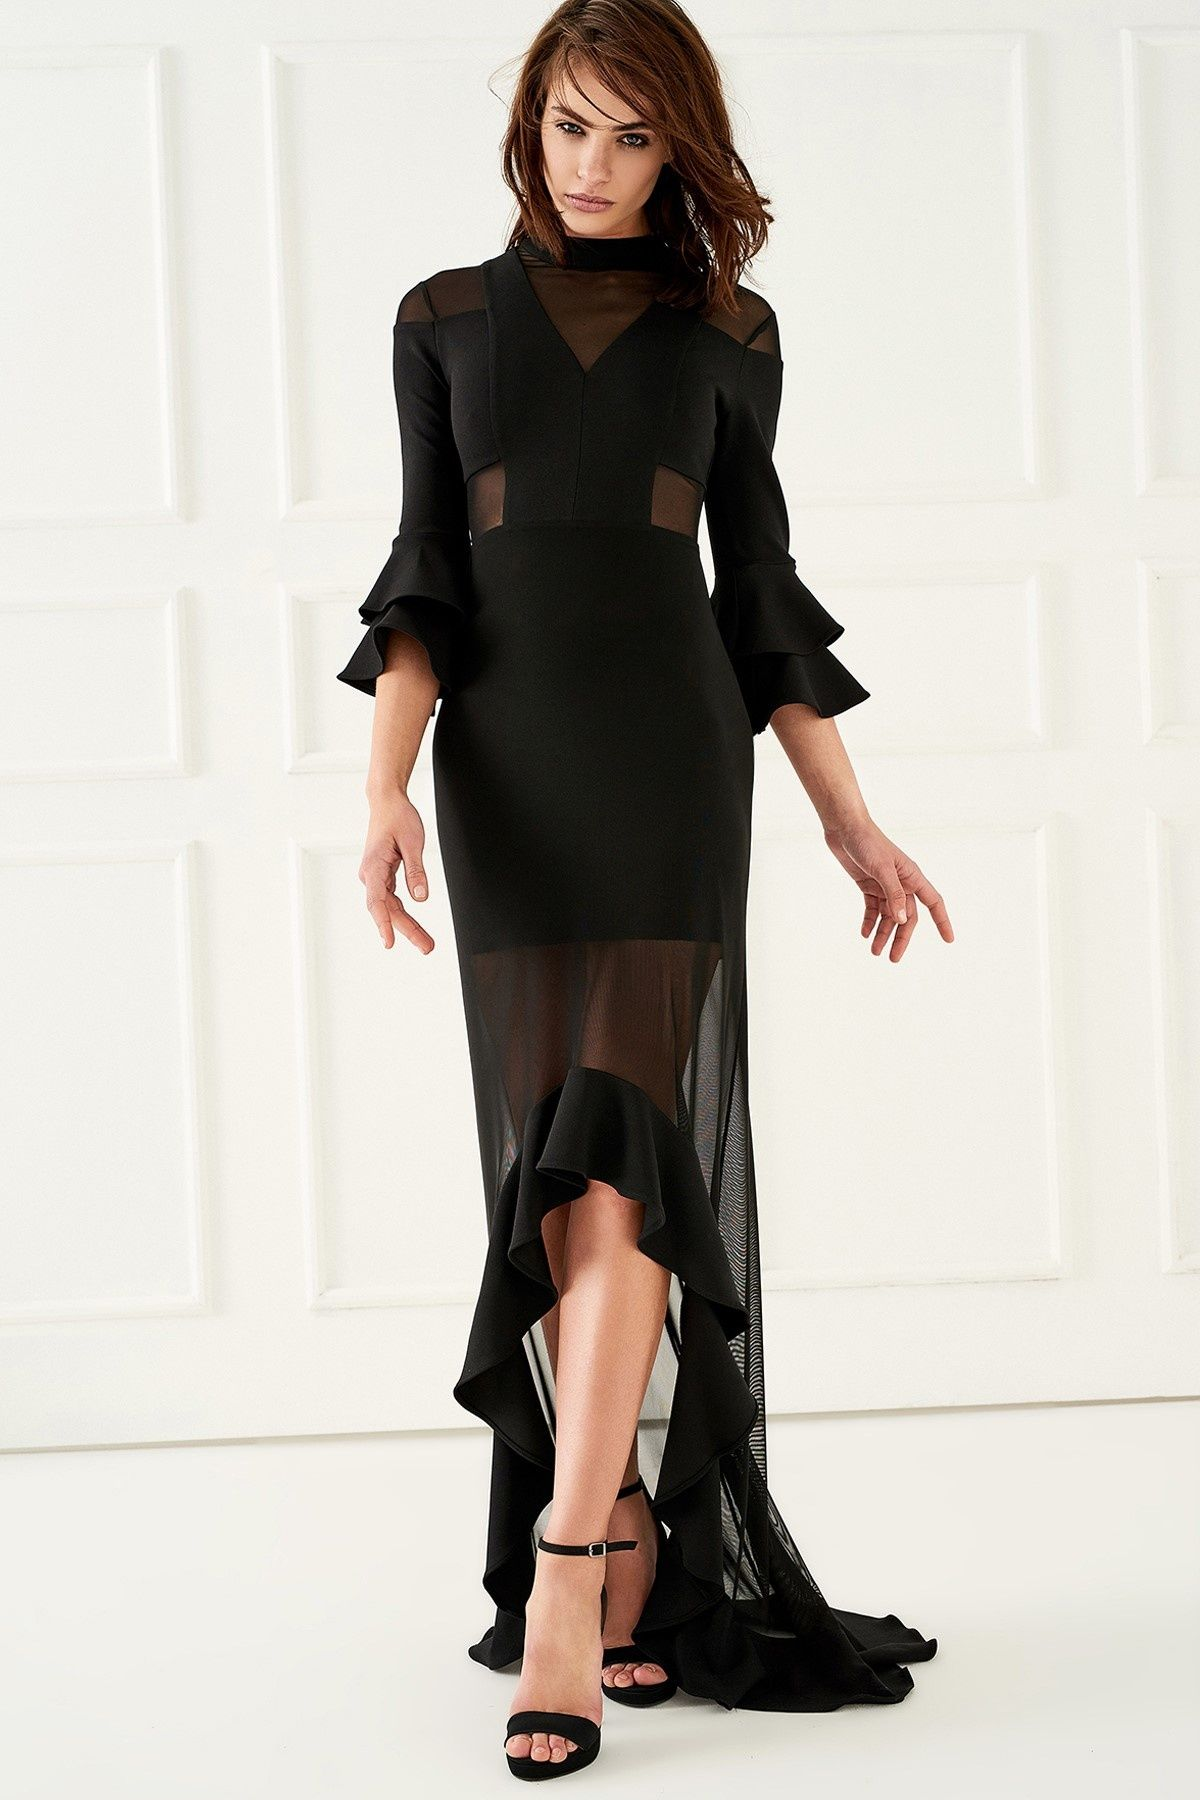 Siyah Volanli Elbise Trendyolmilla Trendyol Kadin The Dress Peplum Elbise